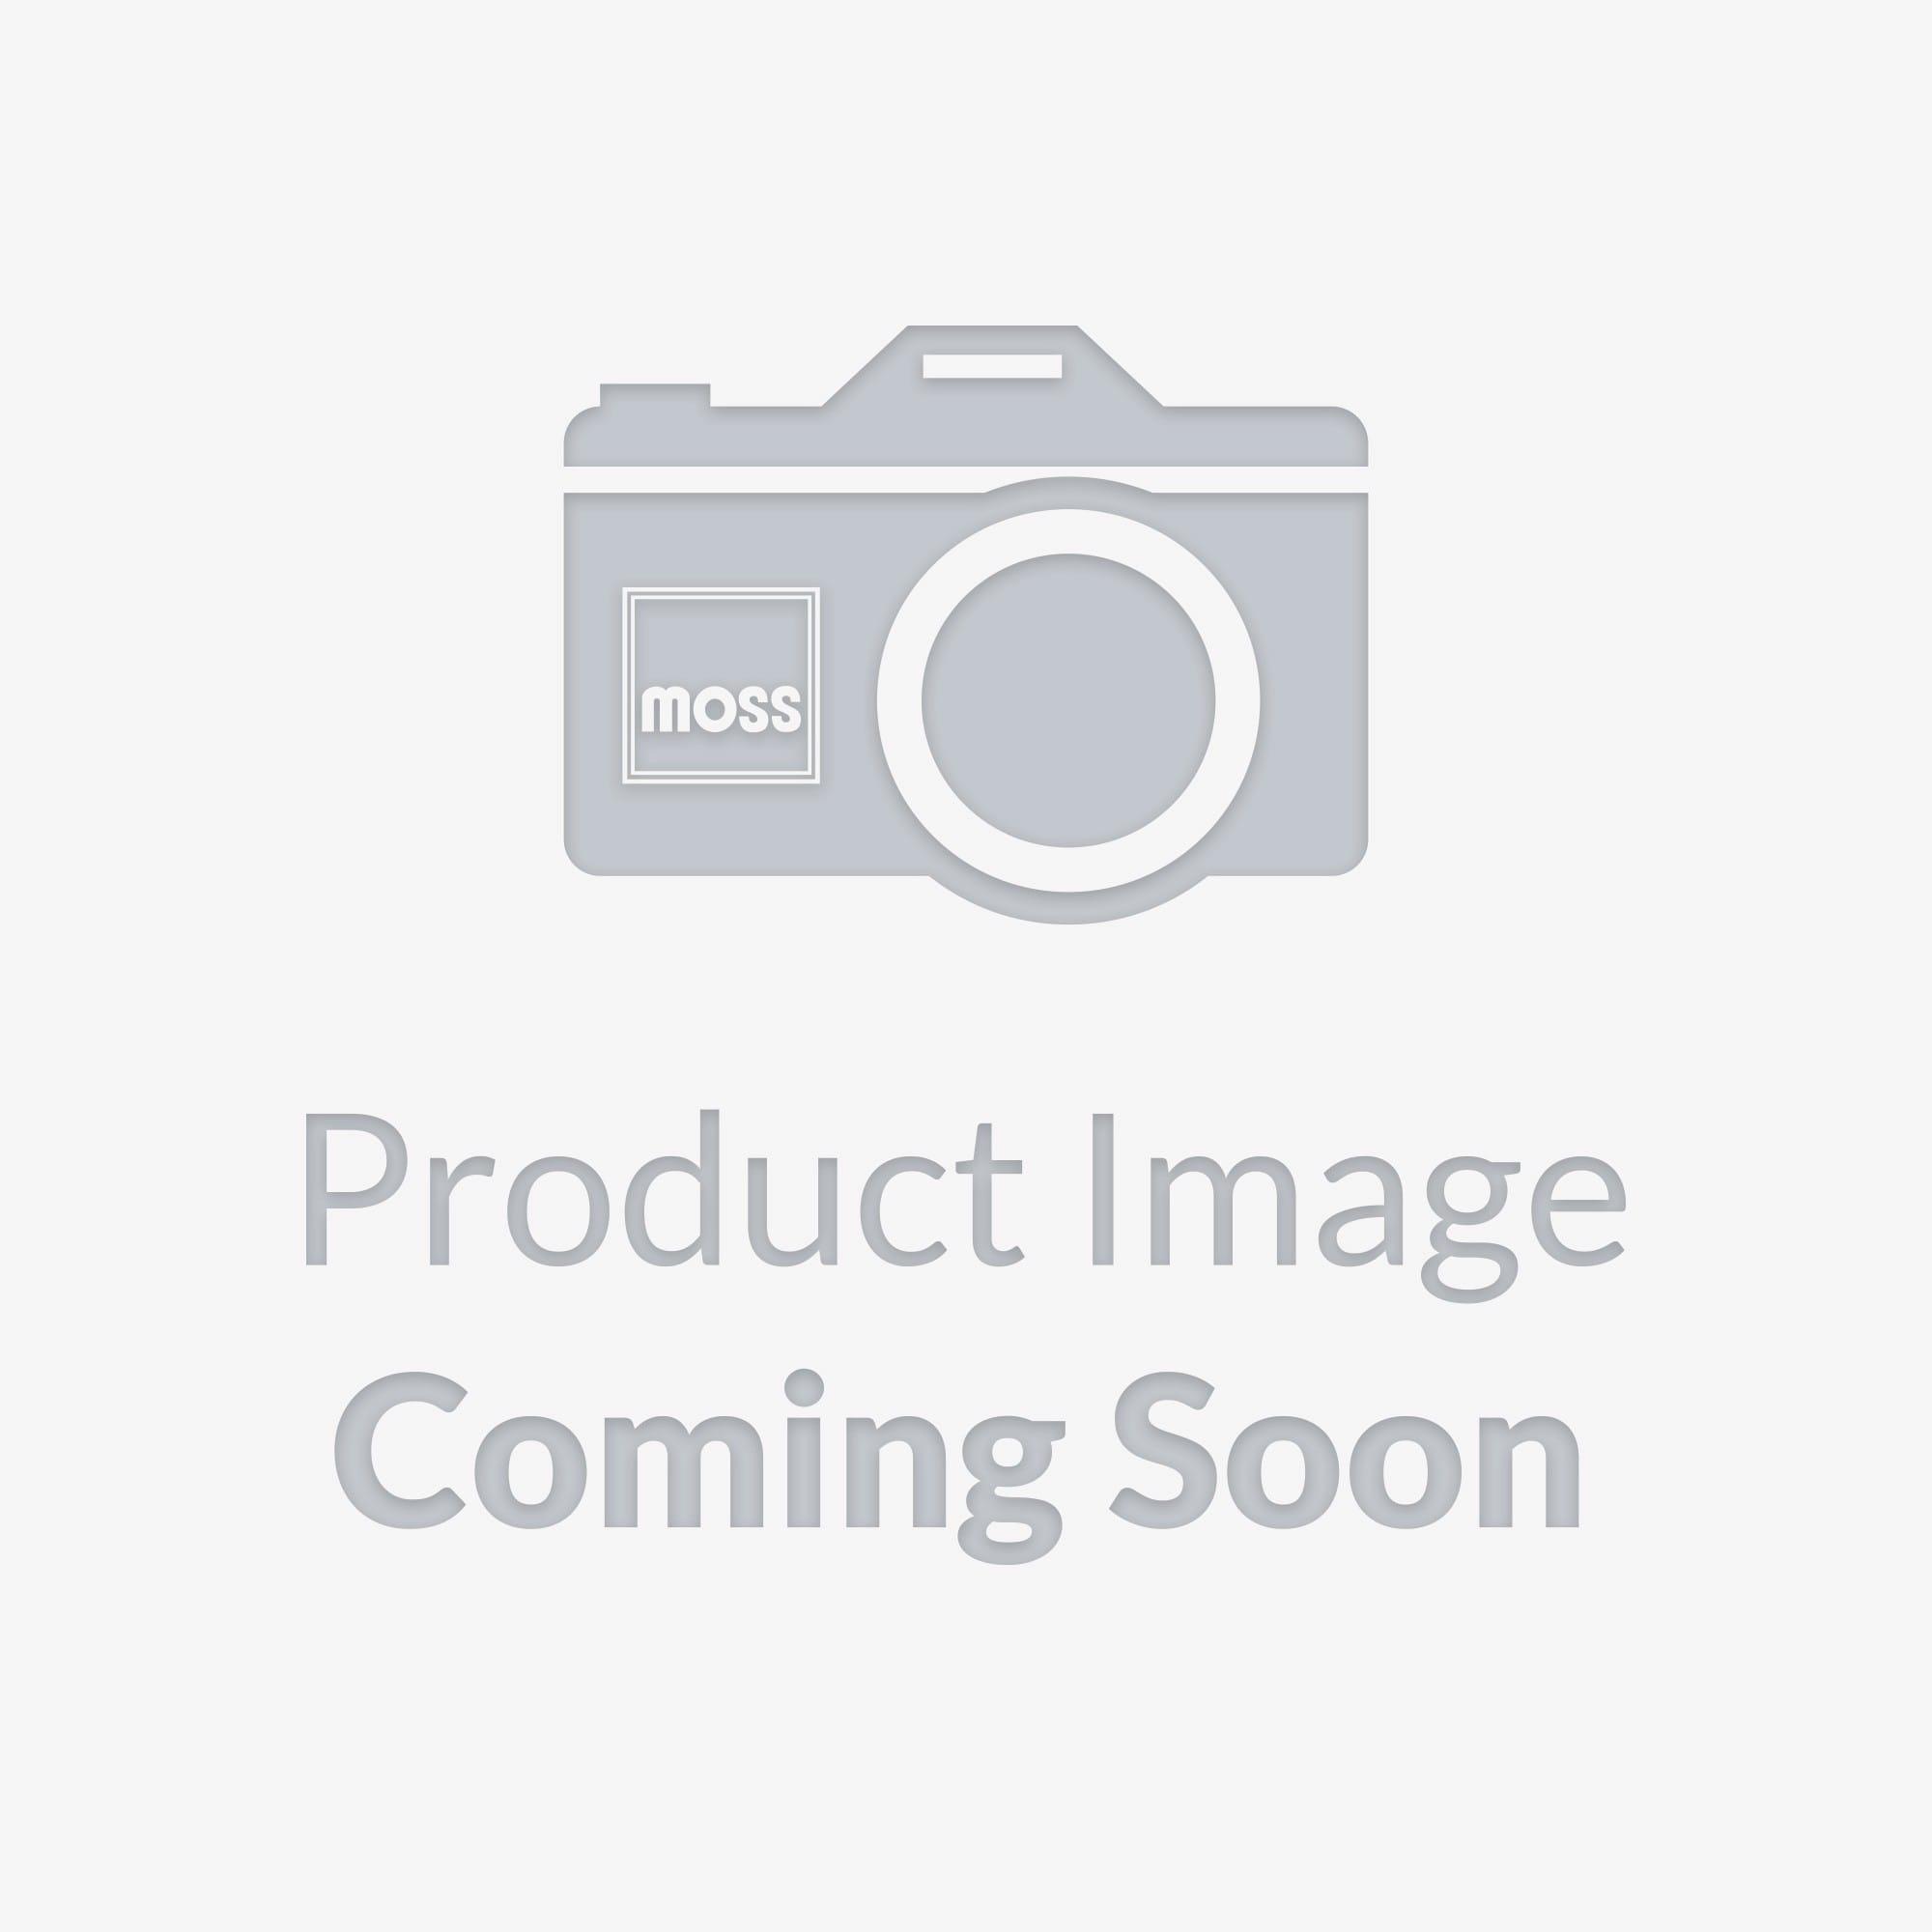 Mg Midget 4 Layer Car Cover 1962 1963 1964 1965 1966 1967 1968 1969 1970 1971